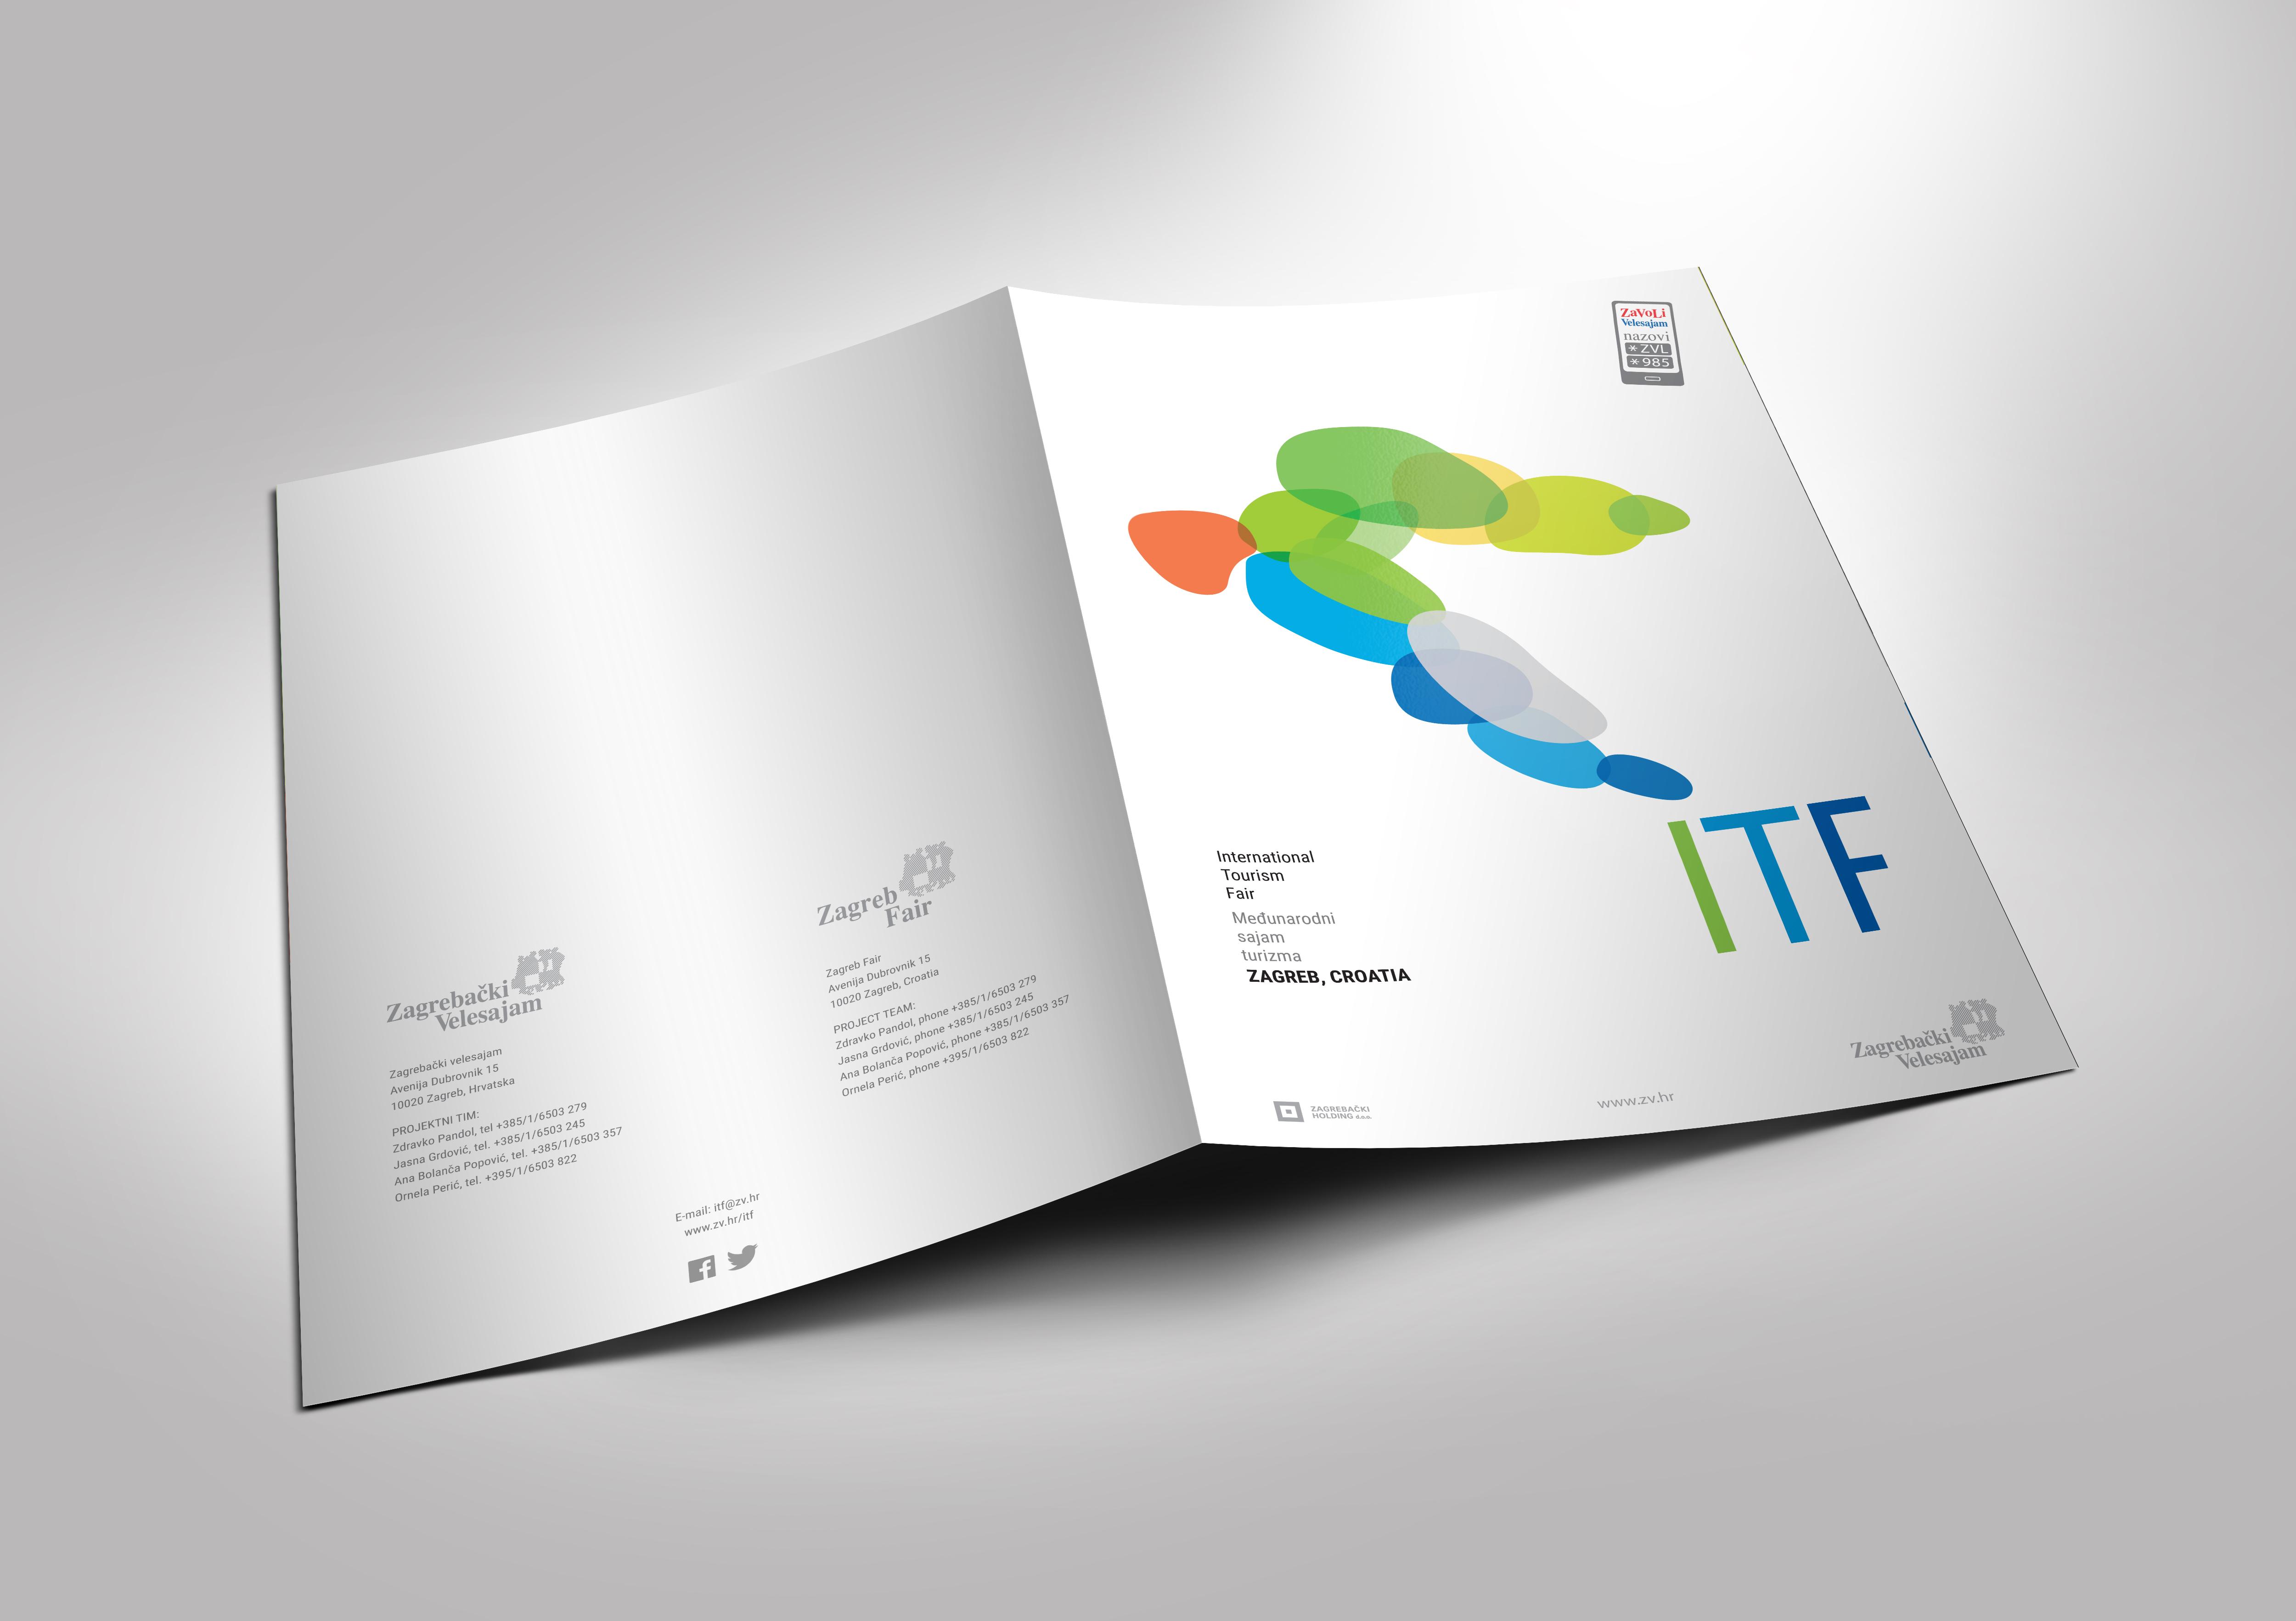 International tourism fair Zagreb, 2015 promo materials folder